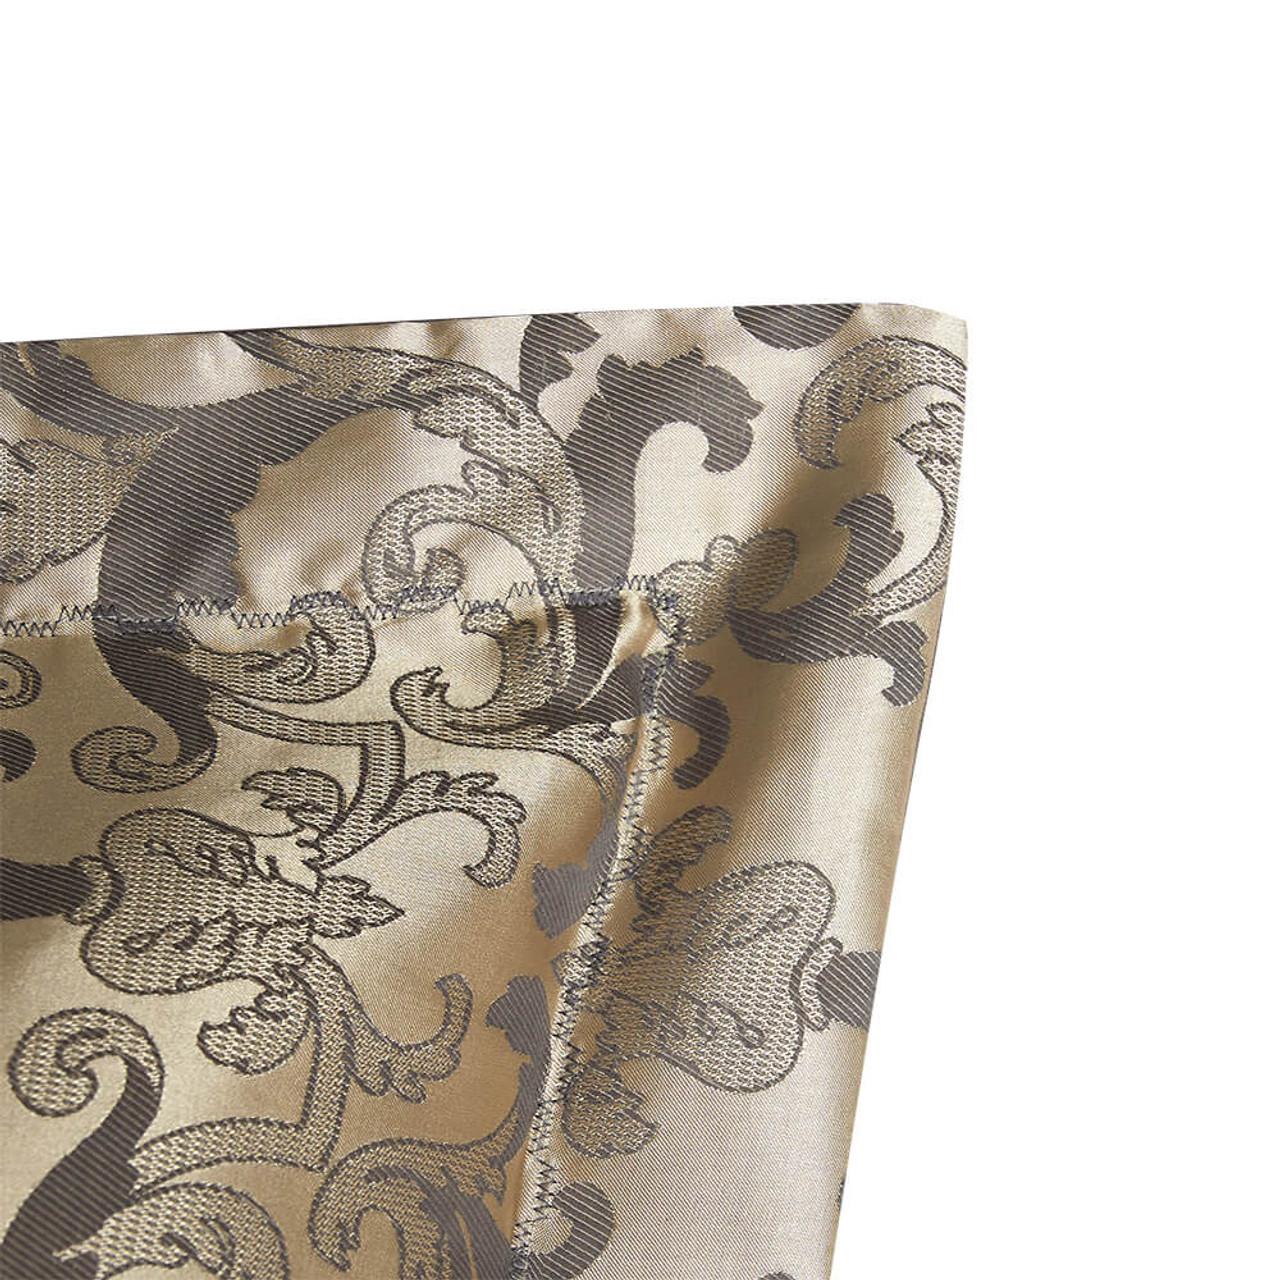 Pillowcases Dolce-Mela Bedding Wholesale-Dropship DM715K